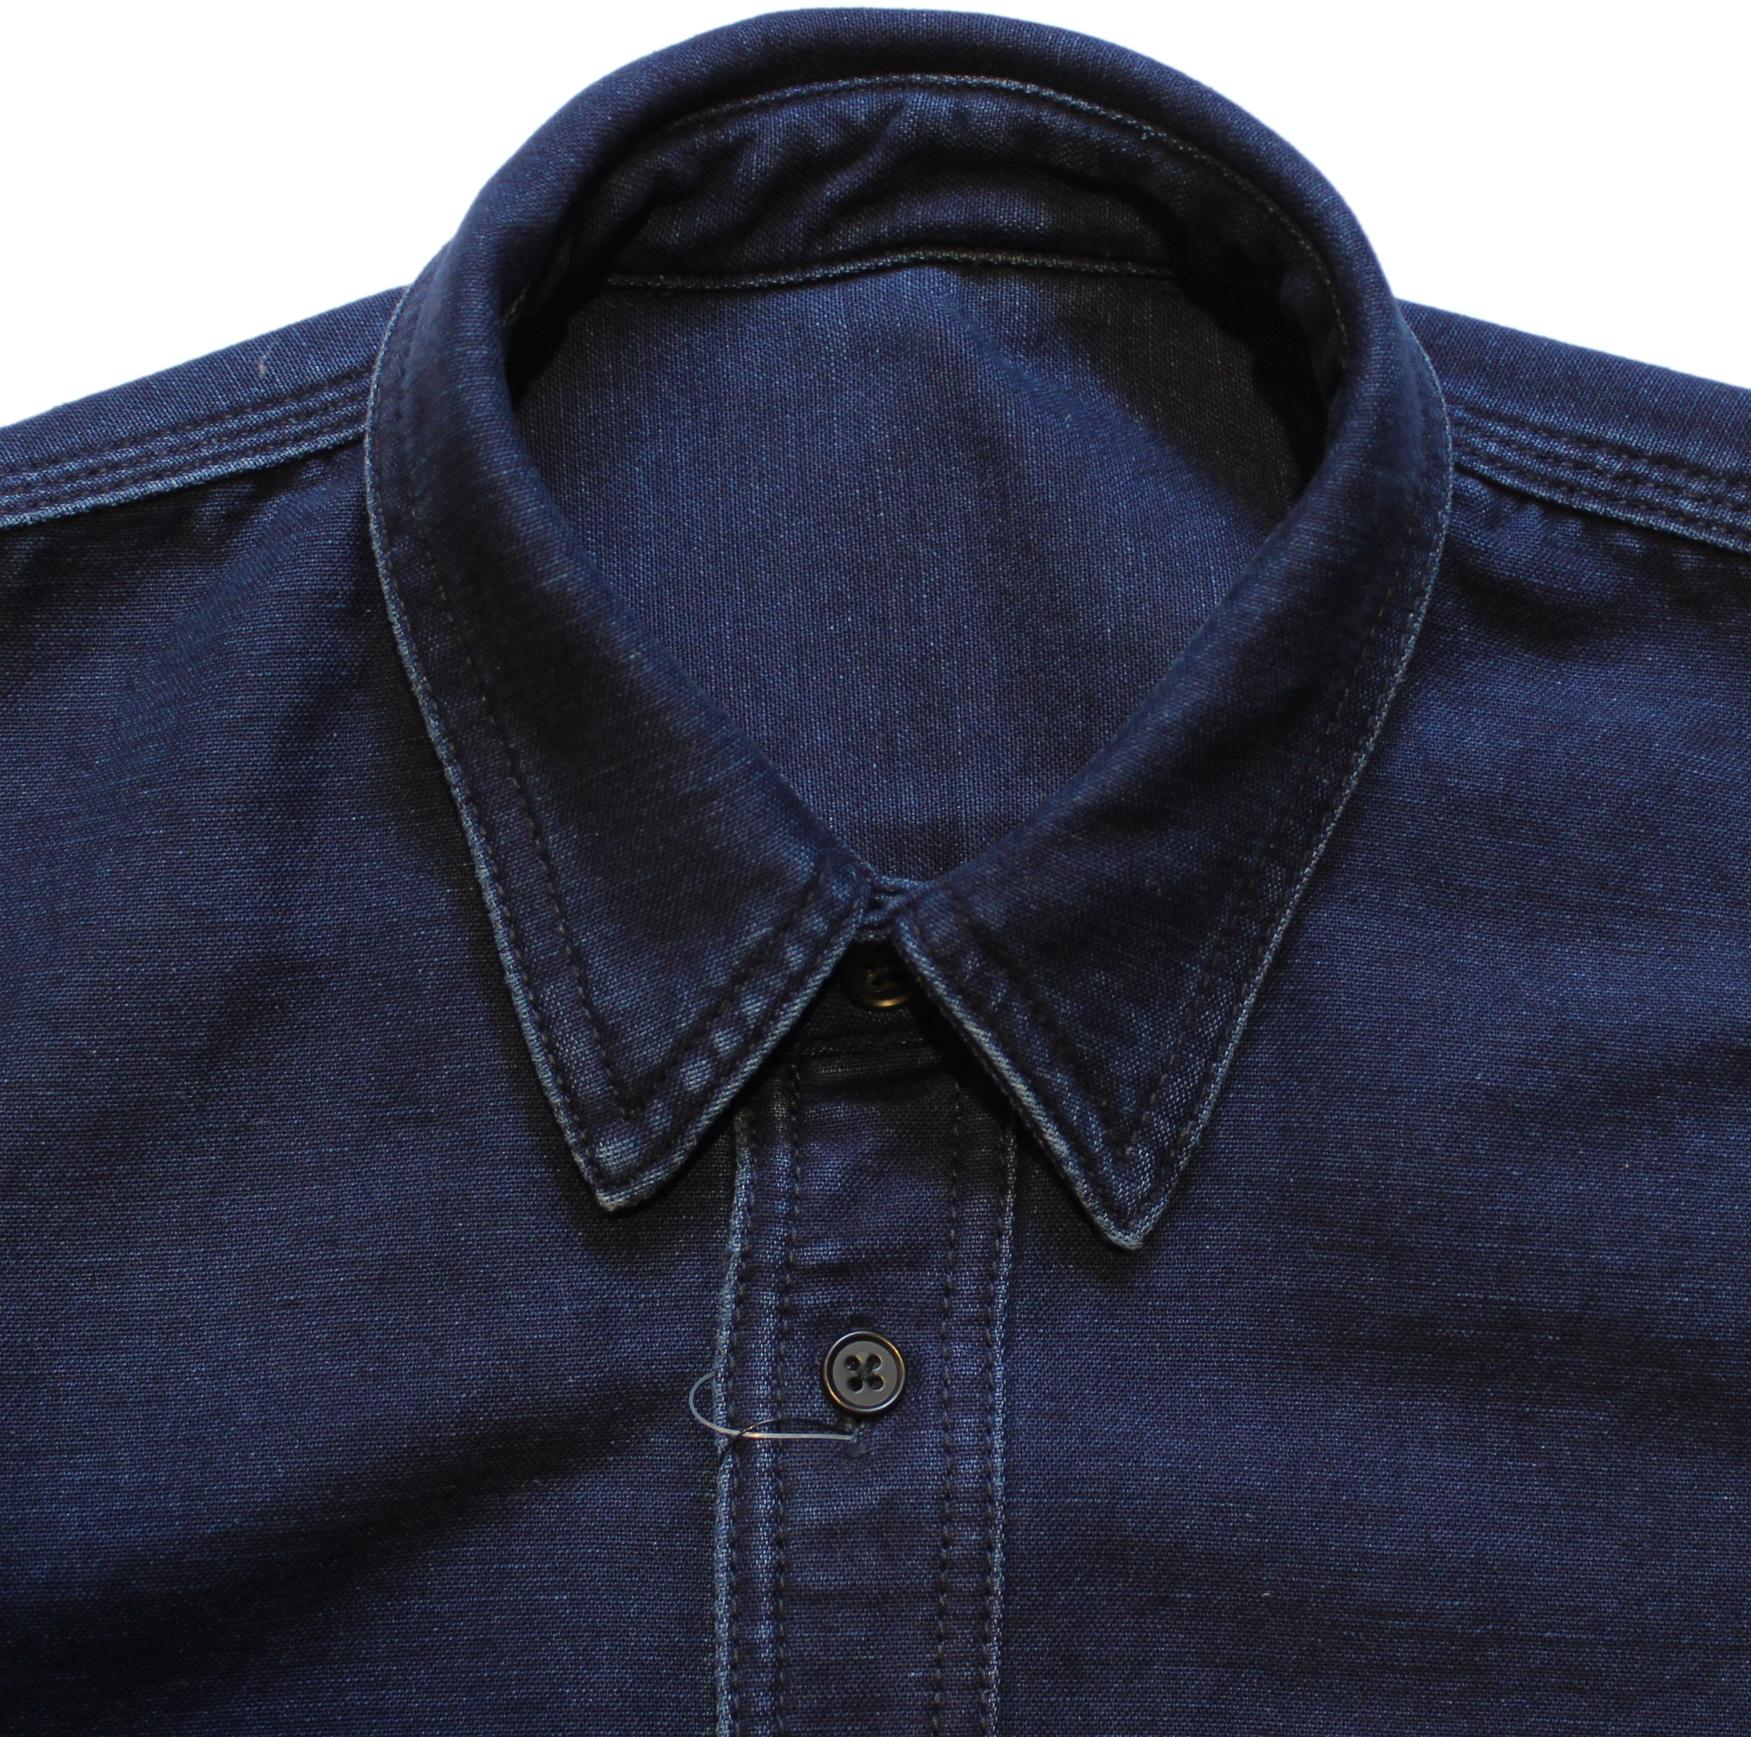 THM-327CH-B-Collar